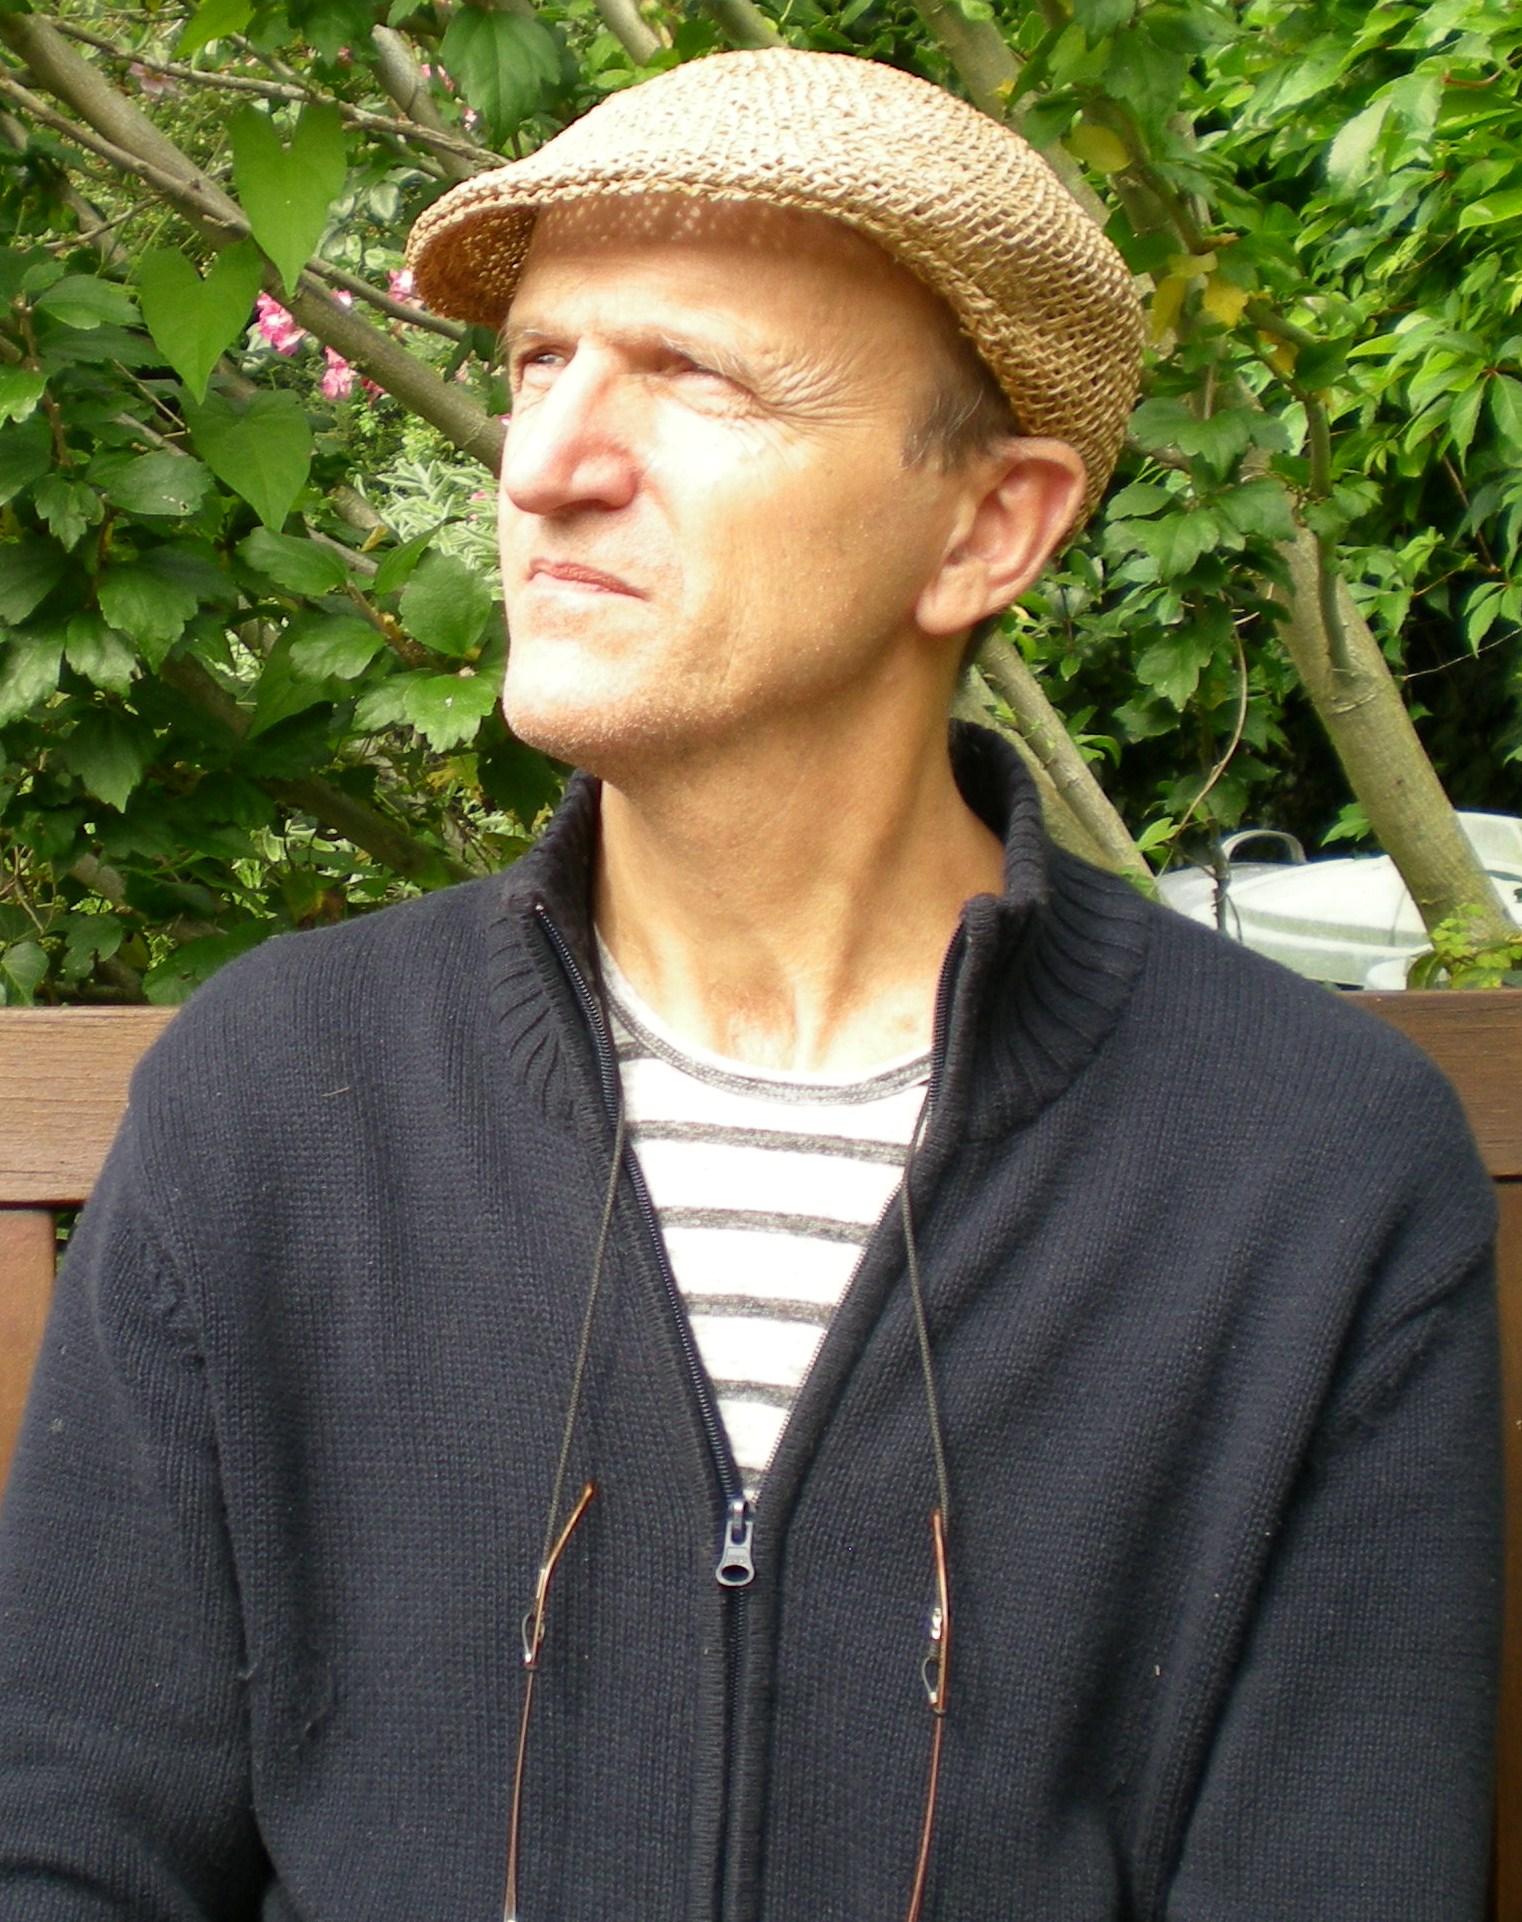 Pirandello traductologue